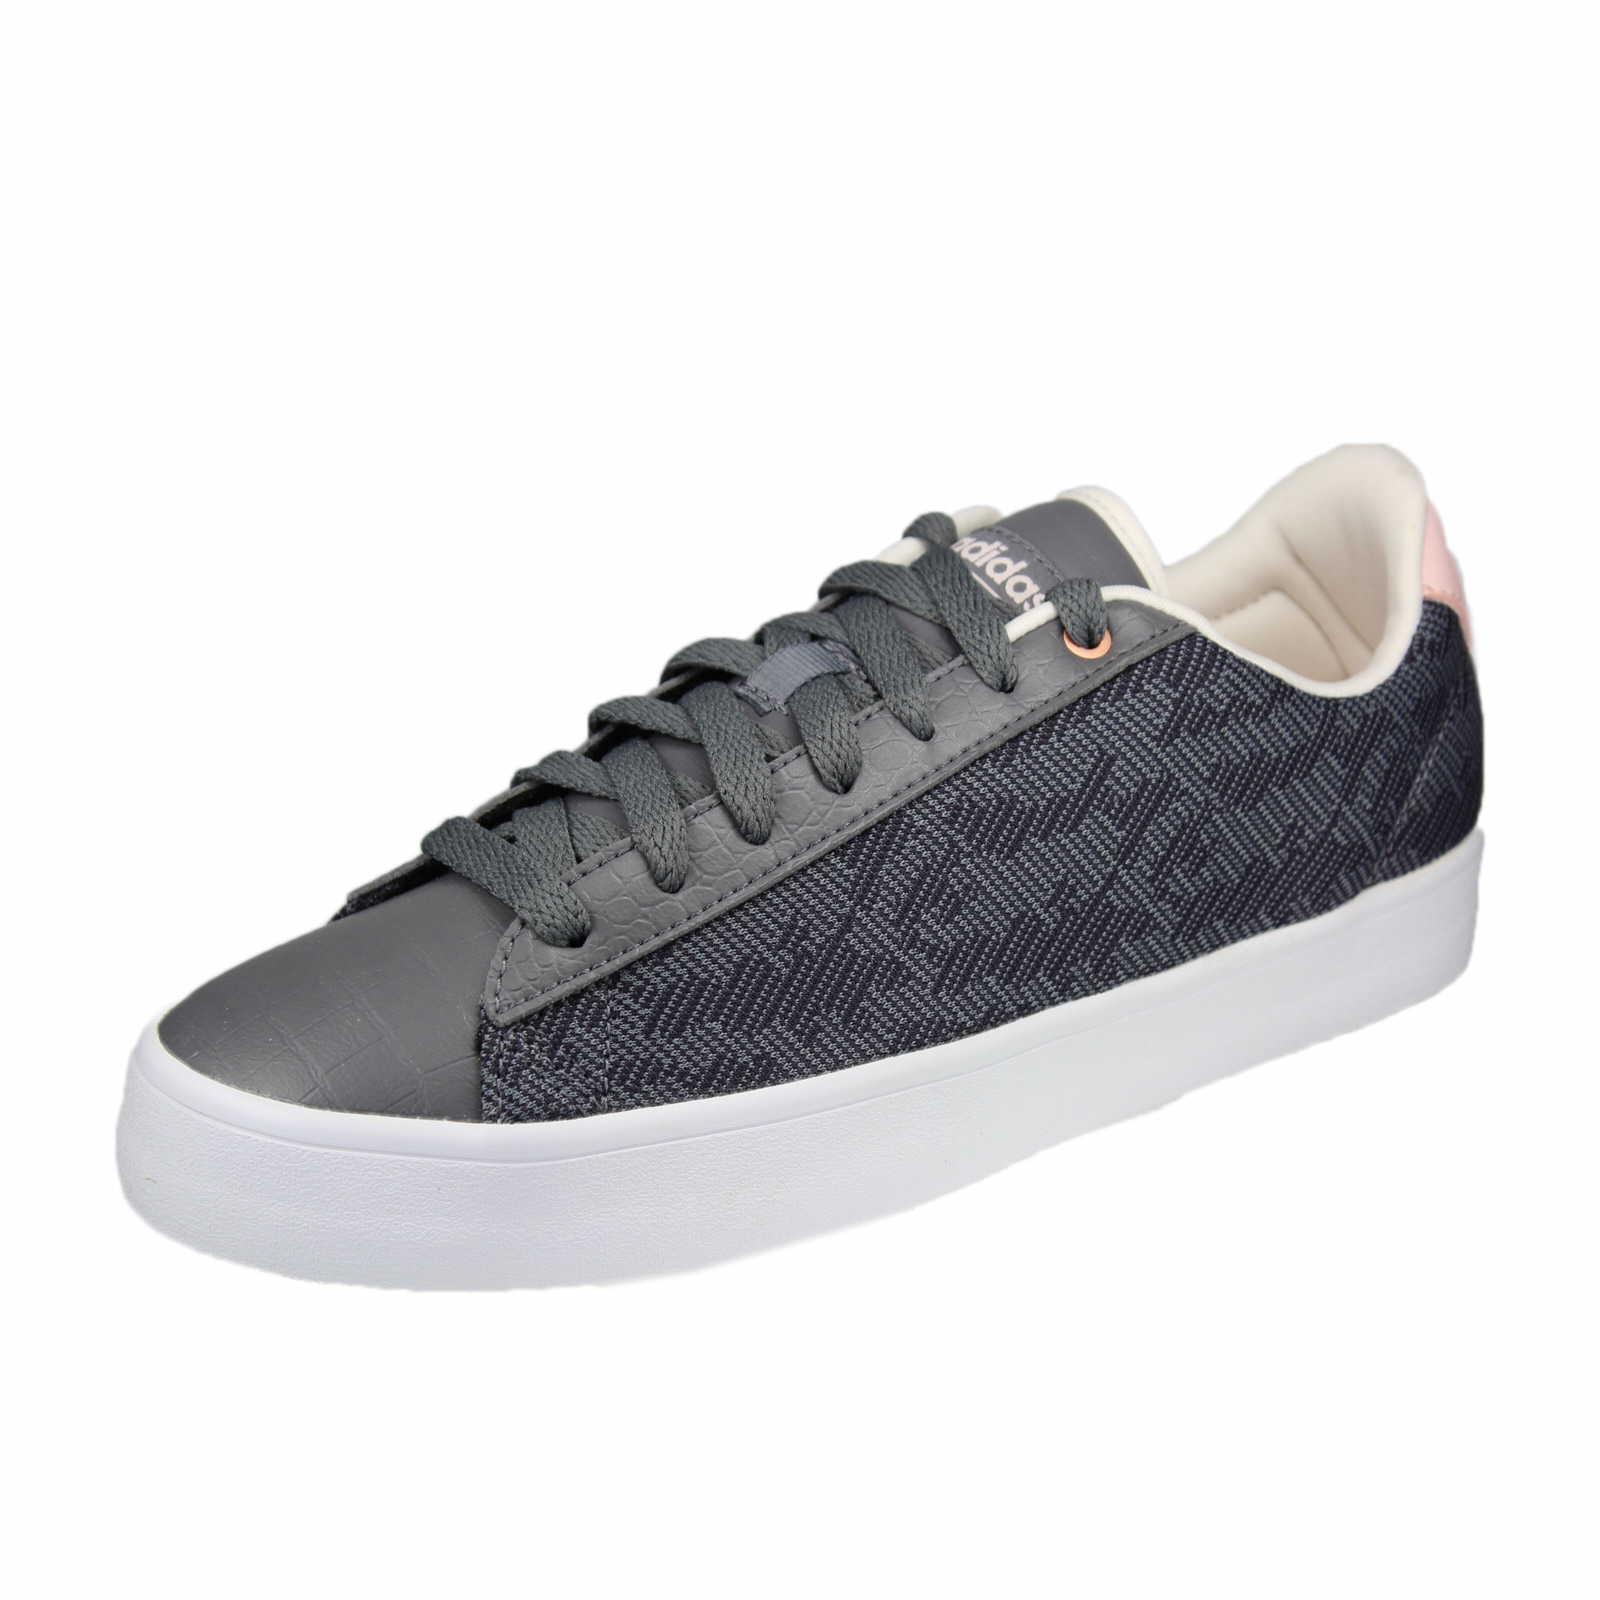 adidas Neo Sneaker in grau | Schuhparadies